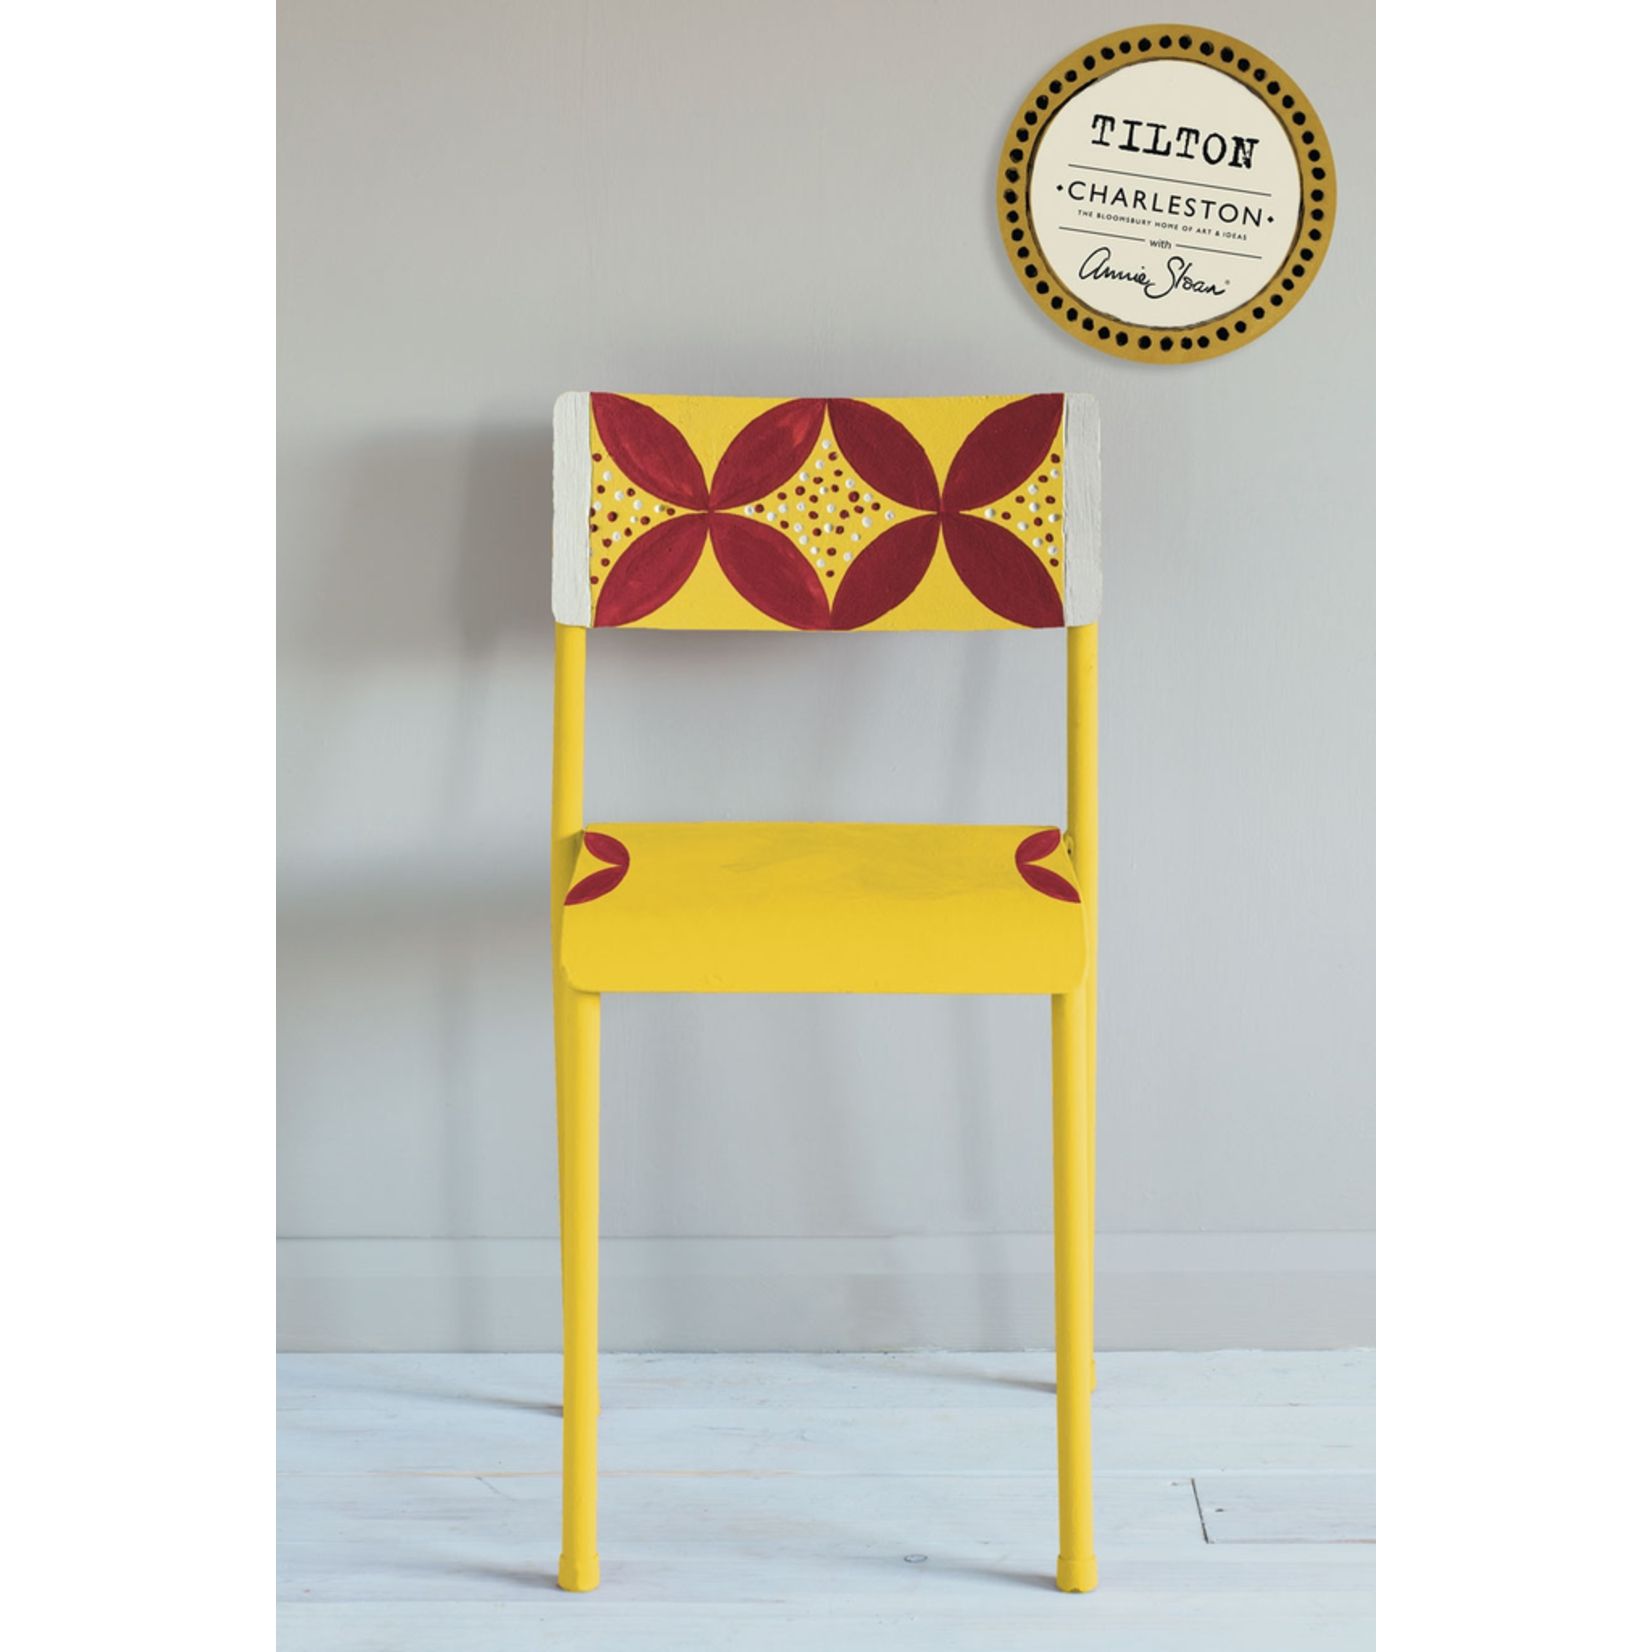 Annie Sloan Annie Sloan Charleston Decorative Paint Set - Tilton